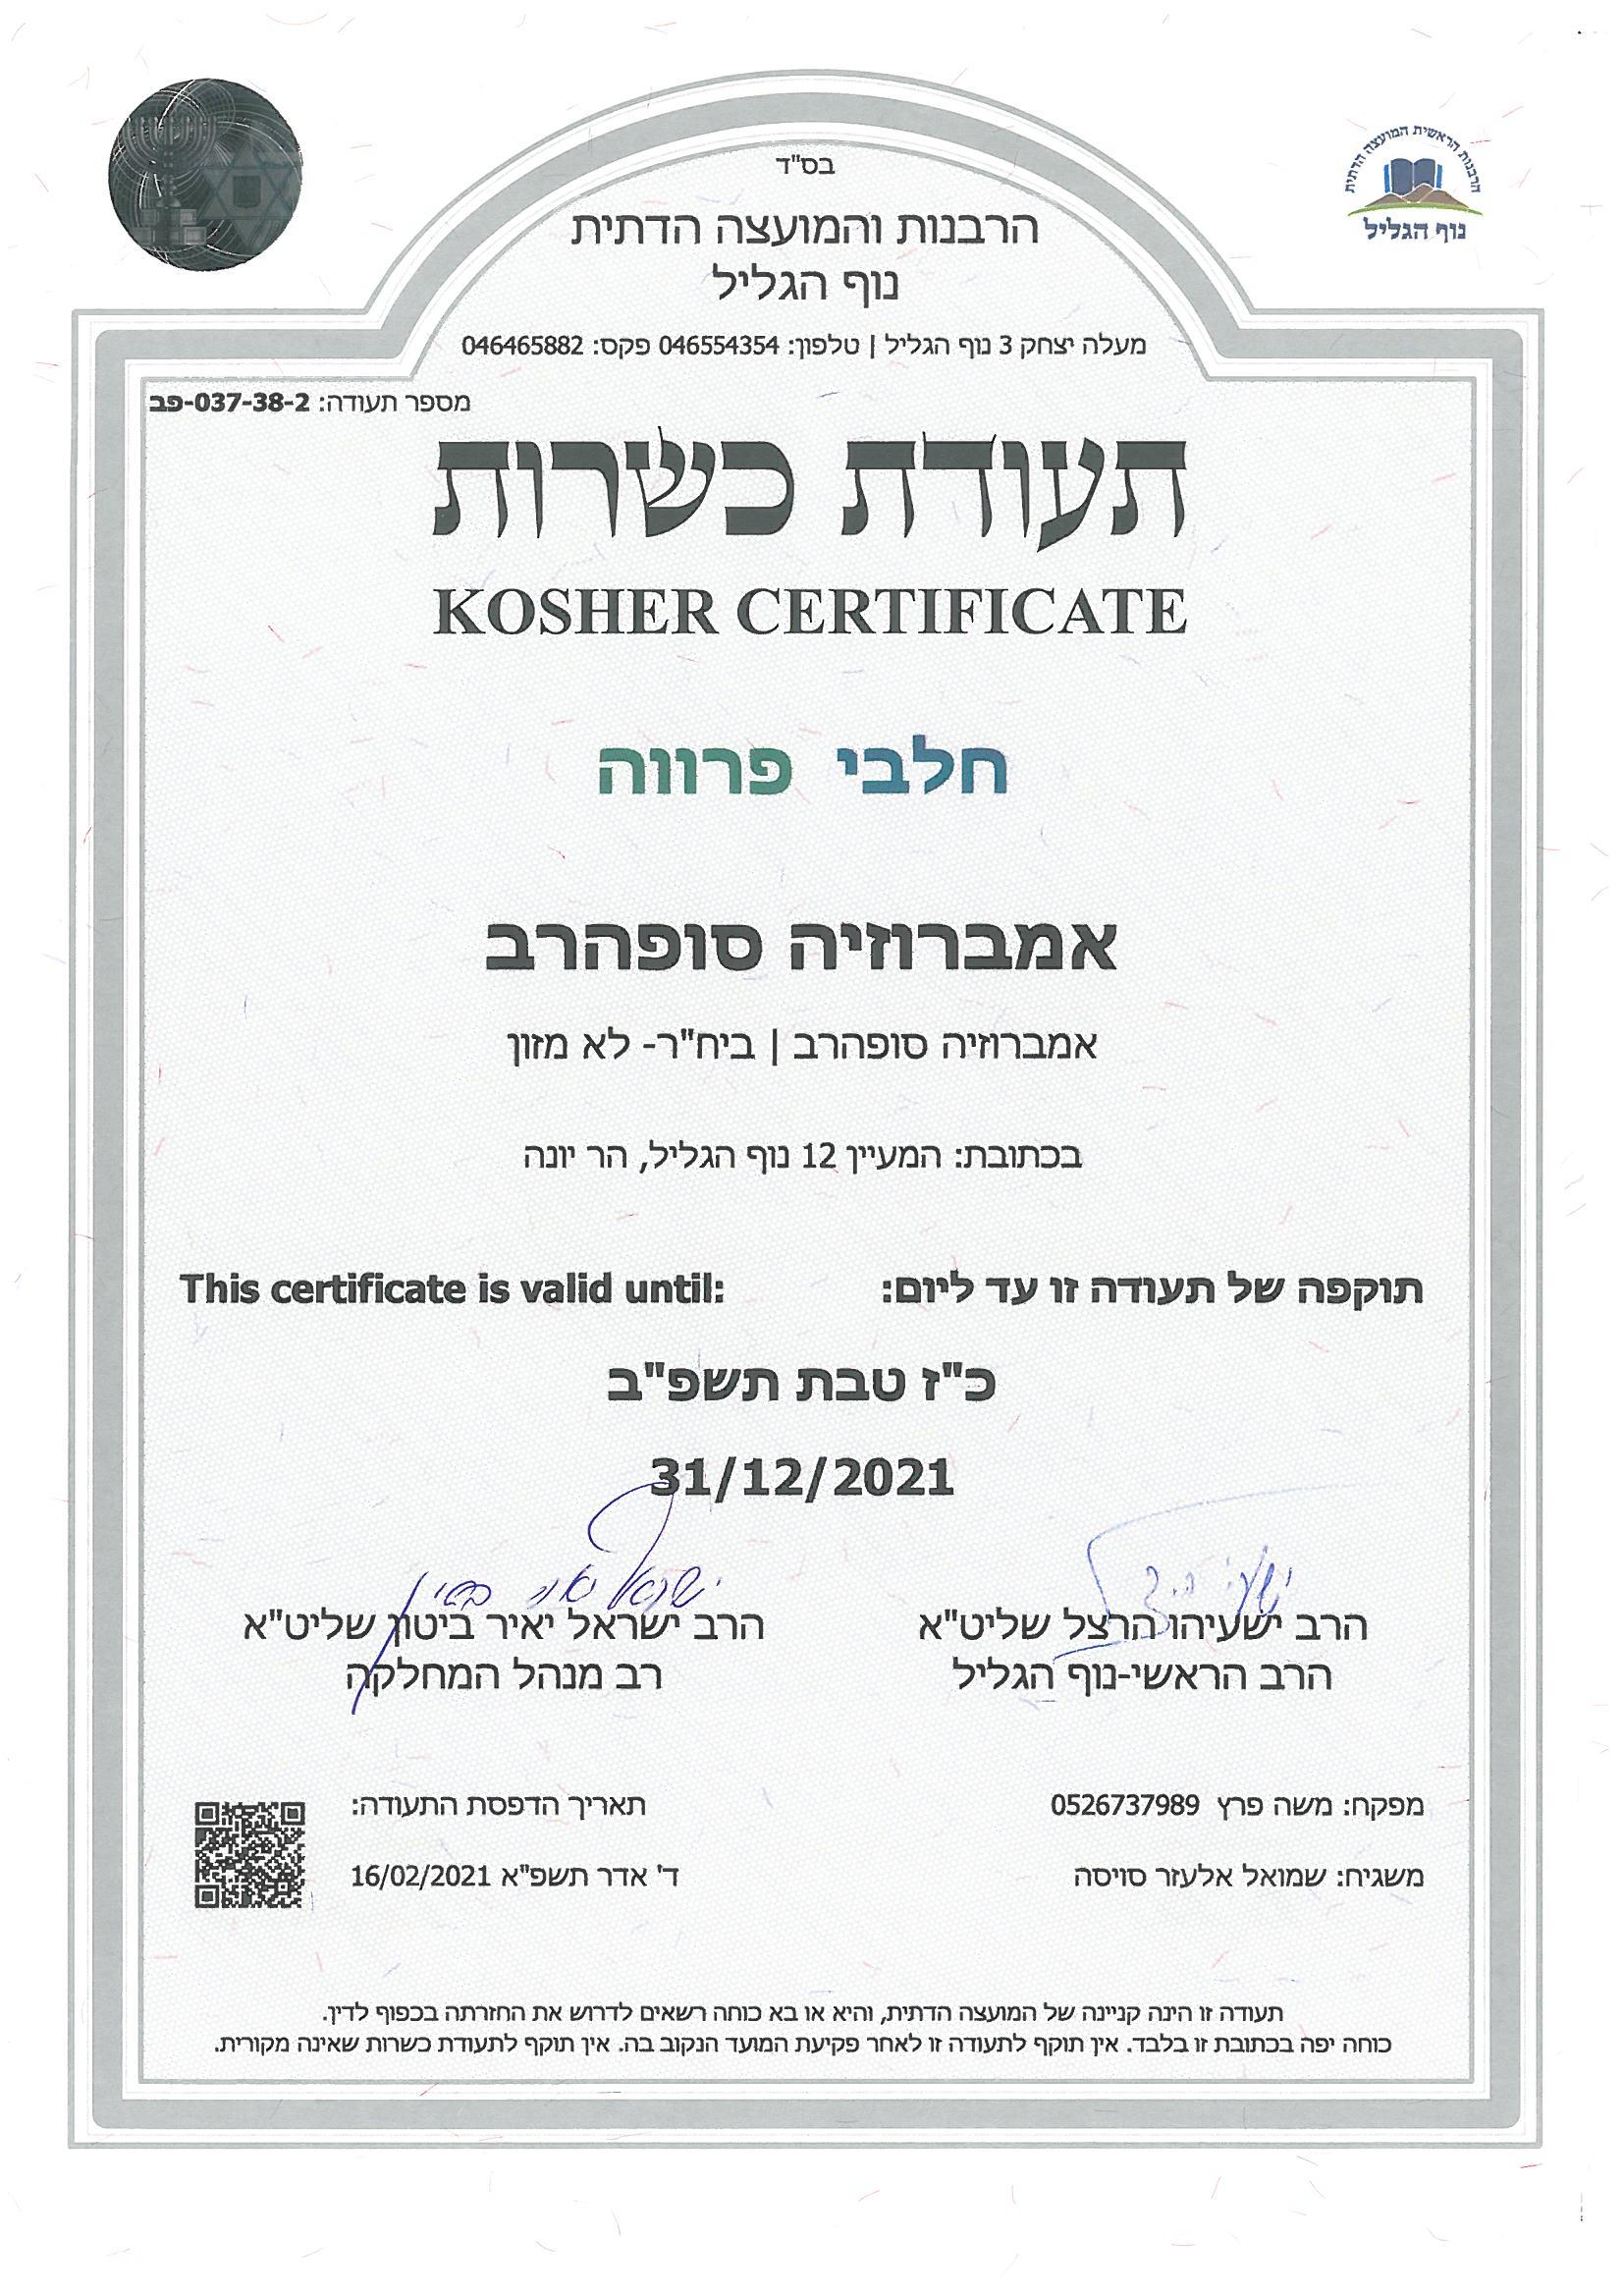 granagard kosher certificate